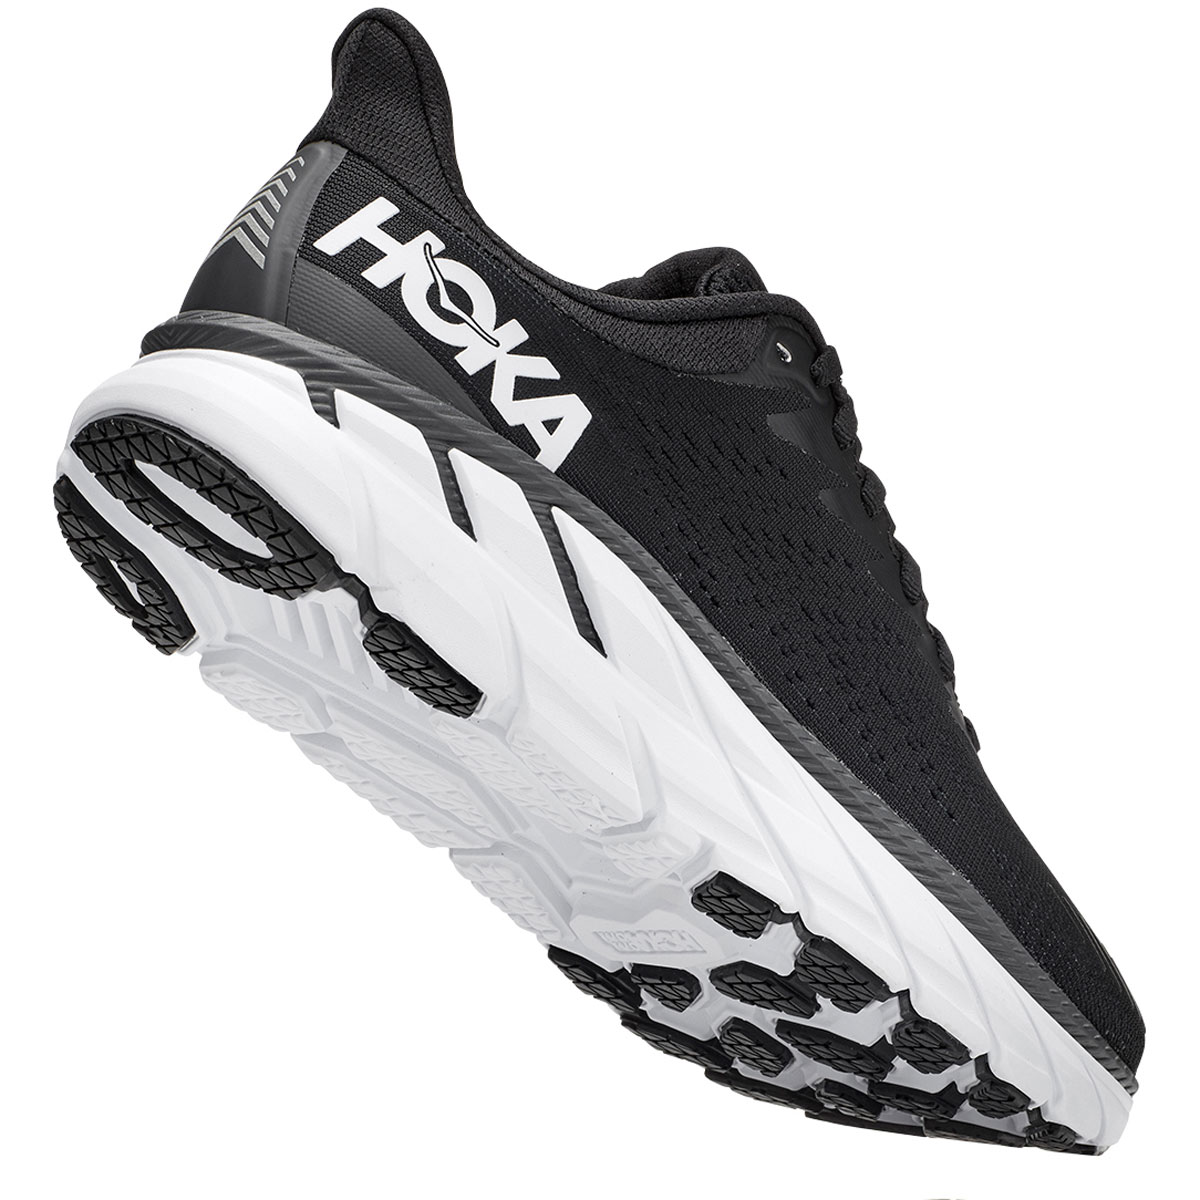 Women's Hoka One One Clifton 7 Running Shoe - Color: Black/White - Size: 5 - Width: Regular, Black/White, large, image 5